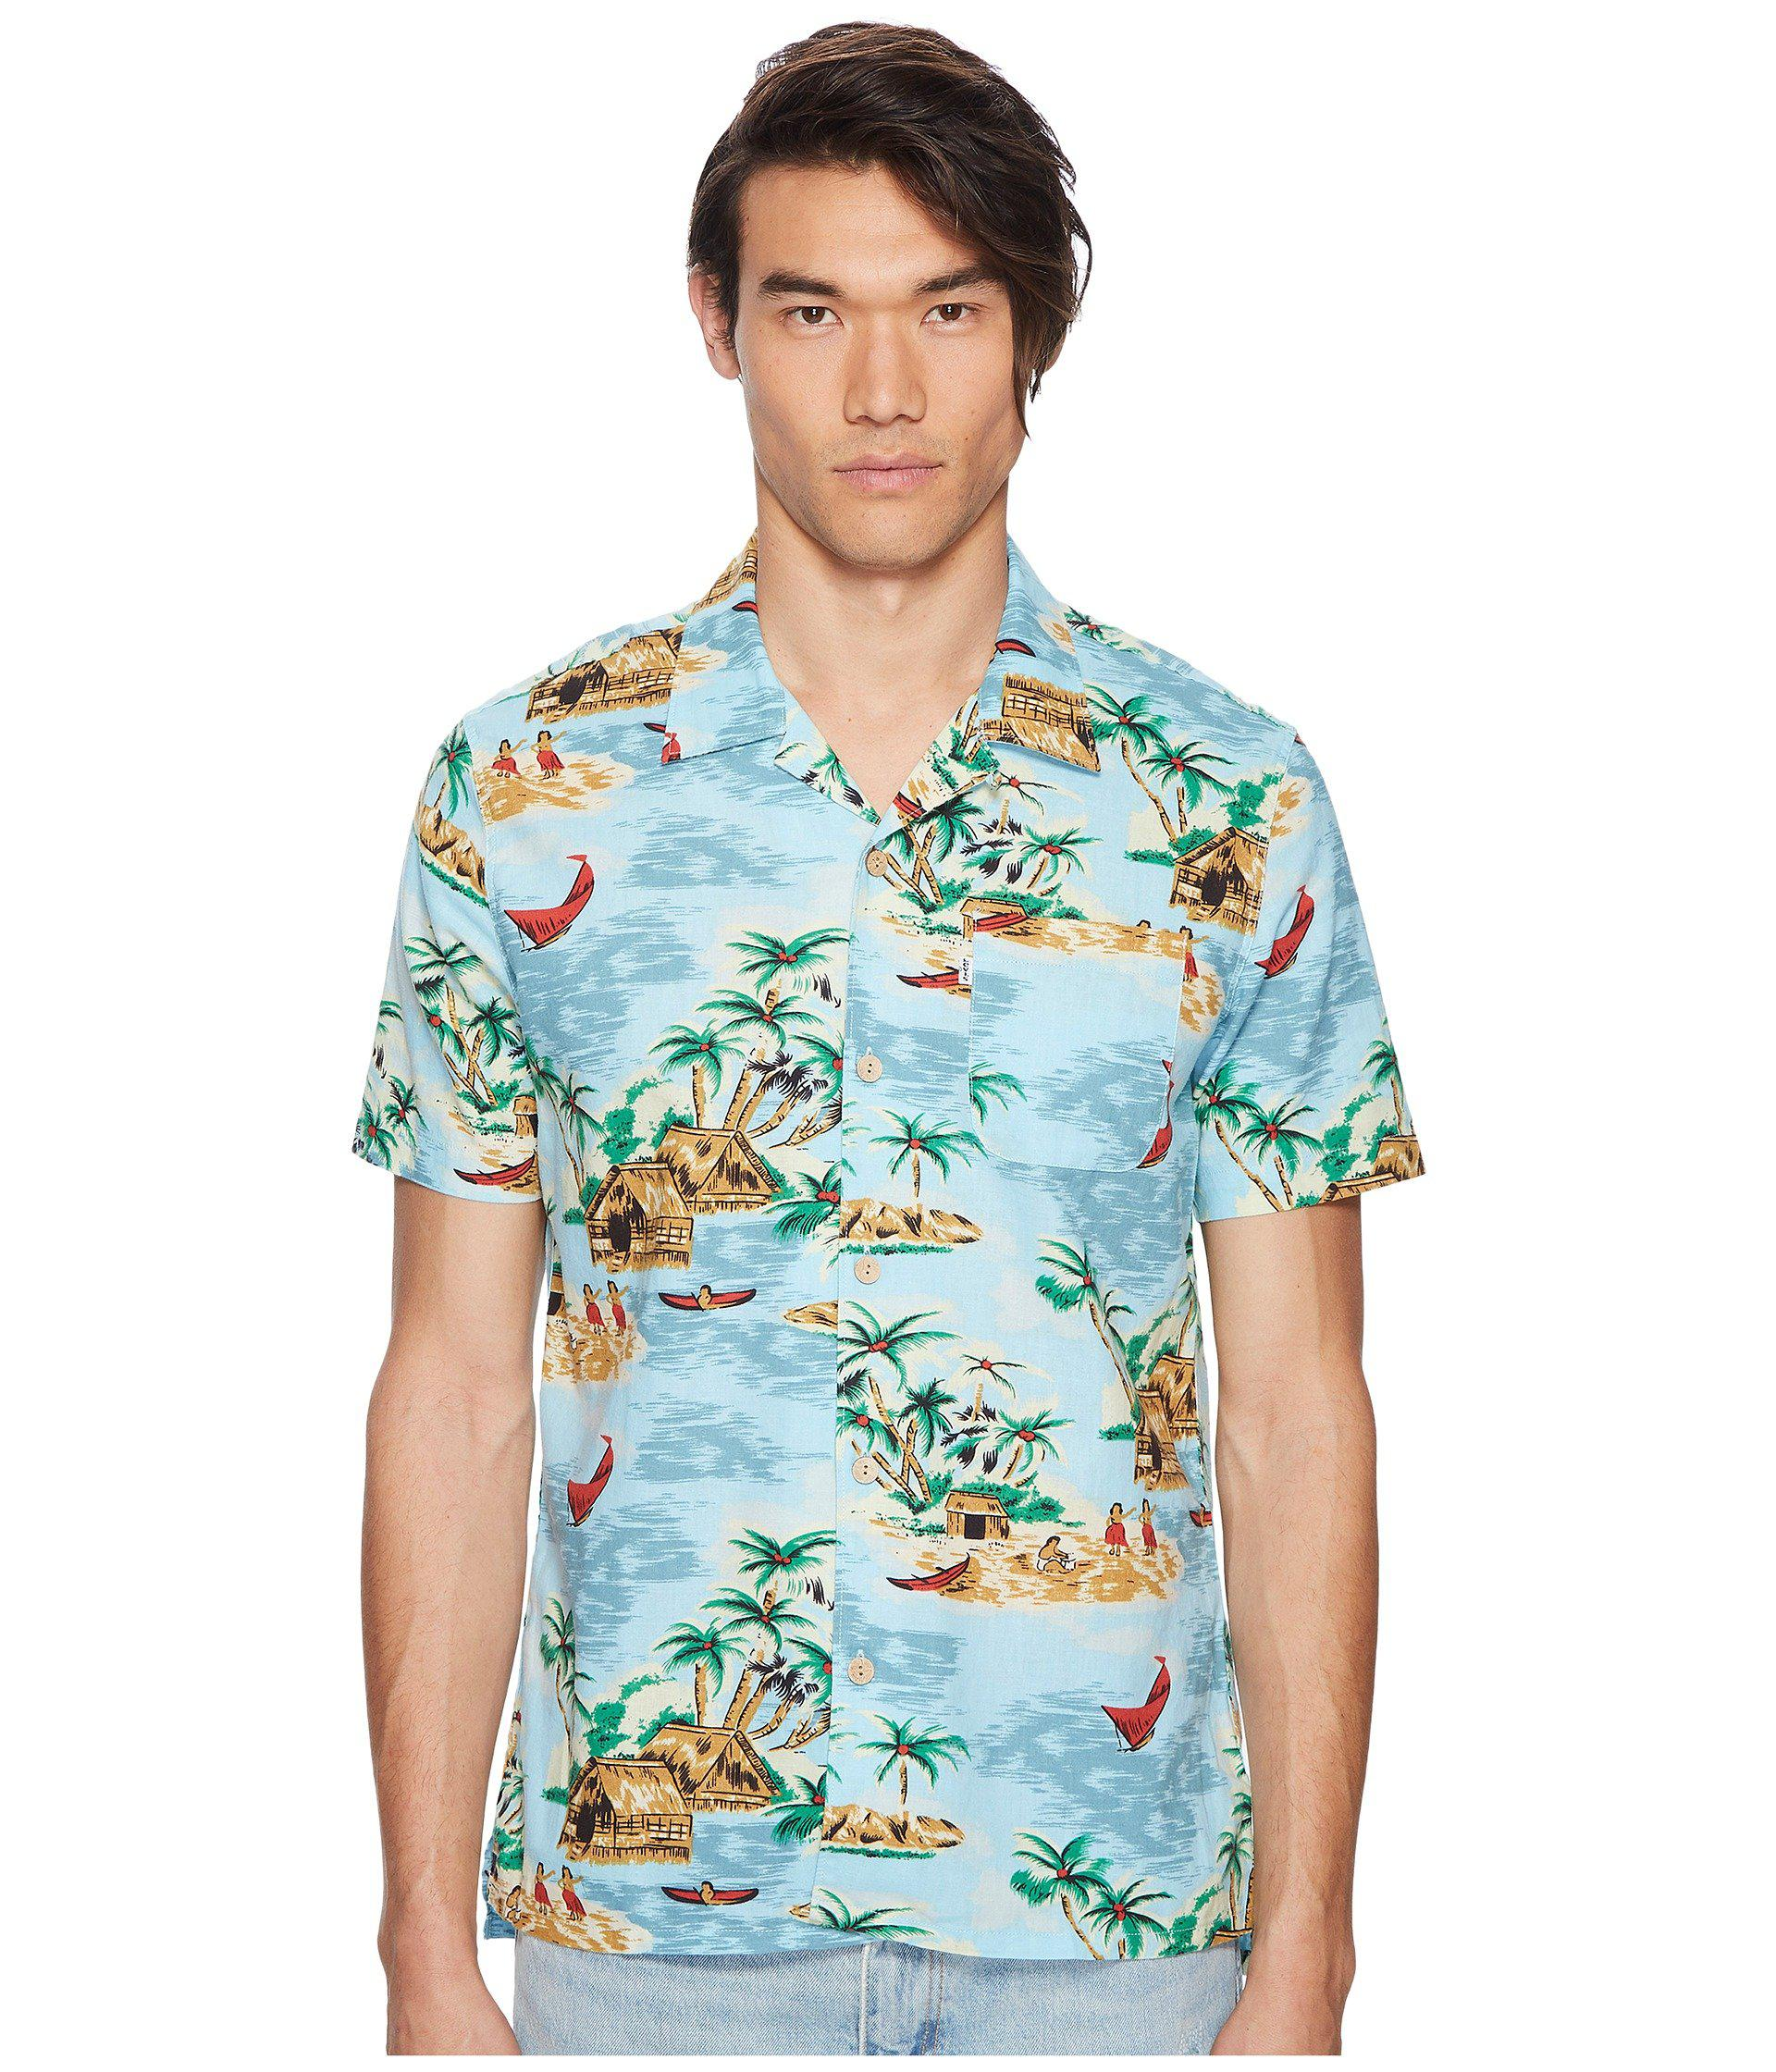 3cae8791 Levi's Premium Premium Short Sleeve Linen Hawaiian Shirt in Blue for ...